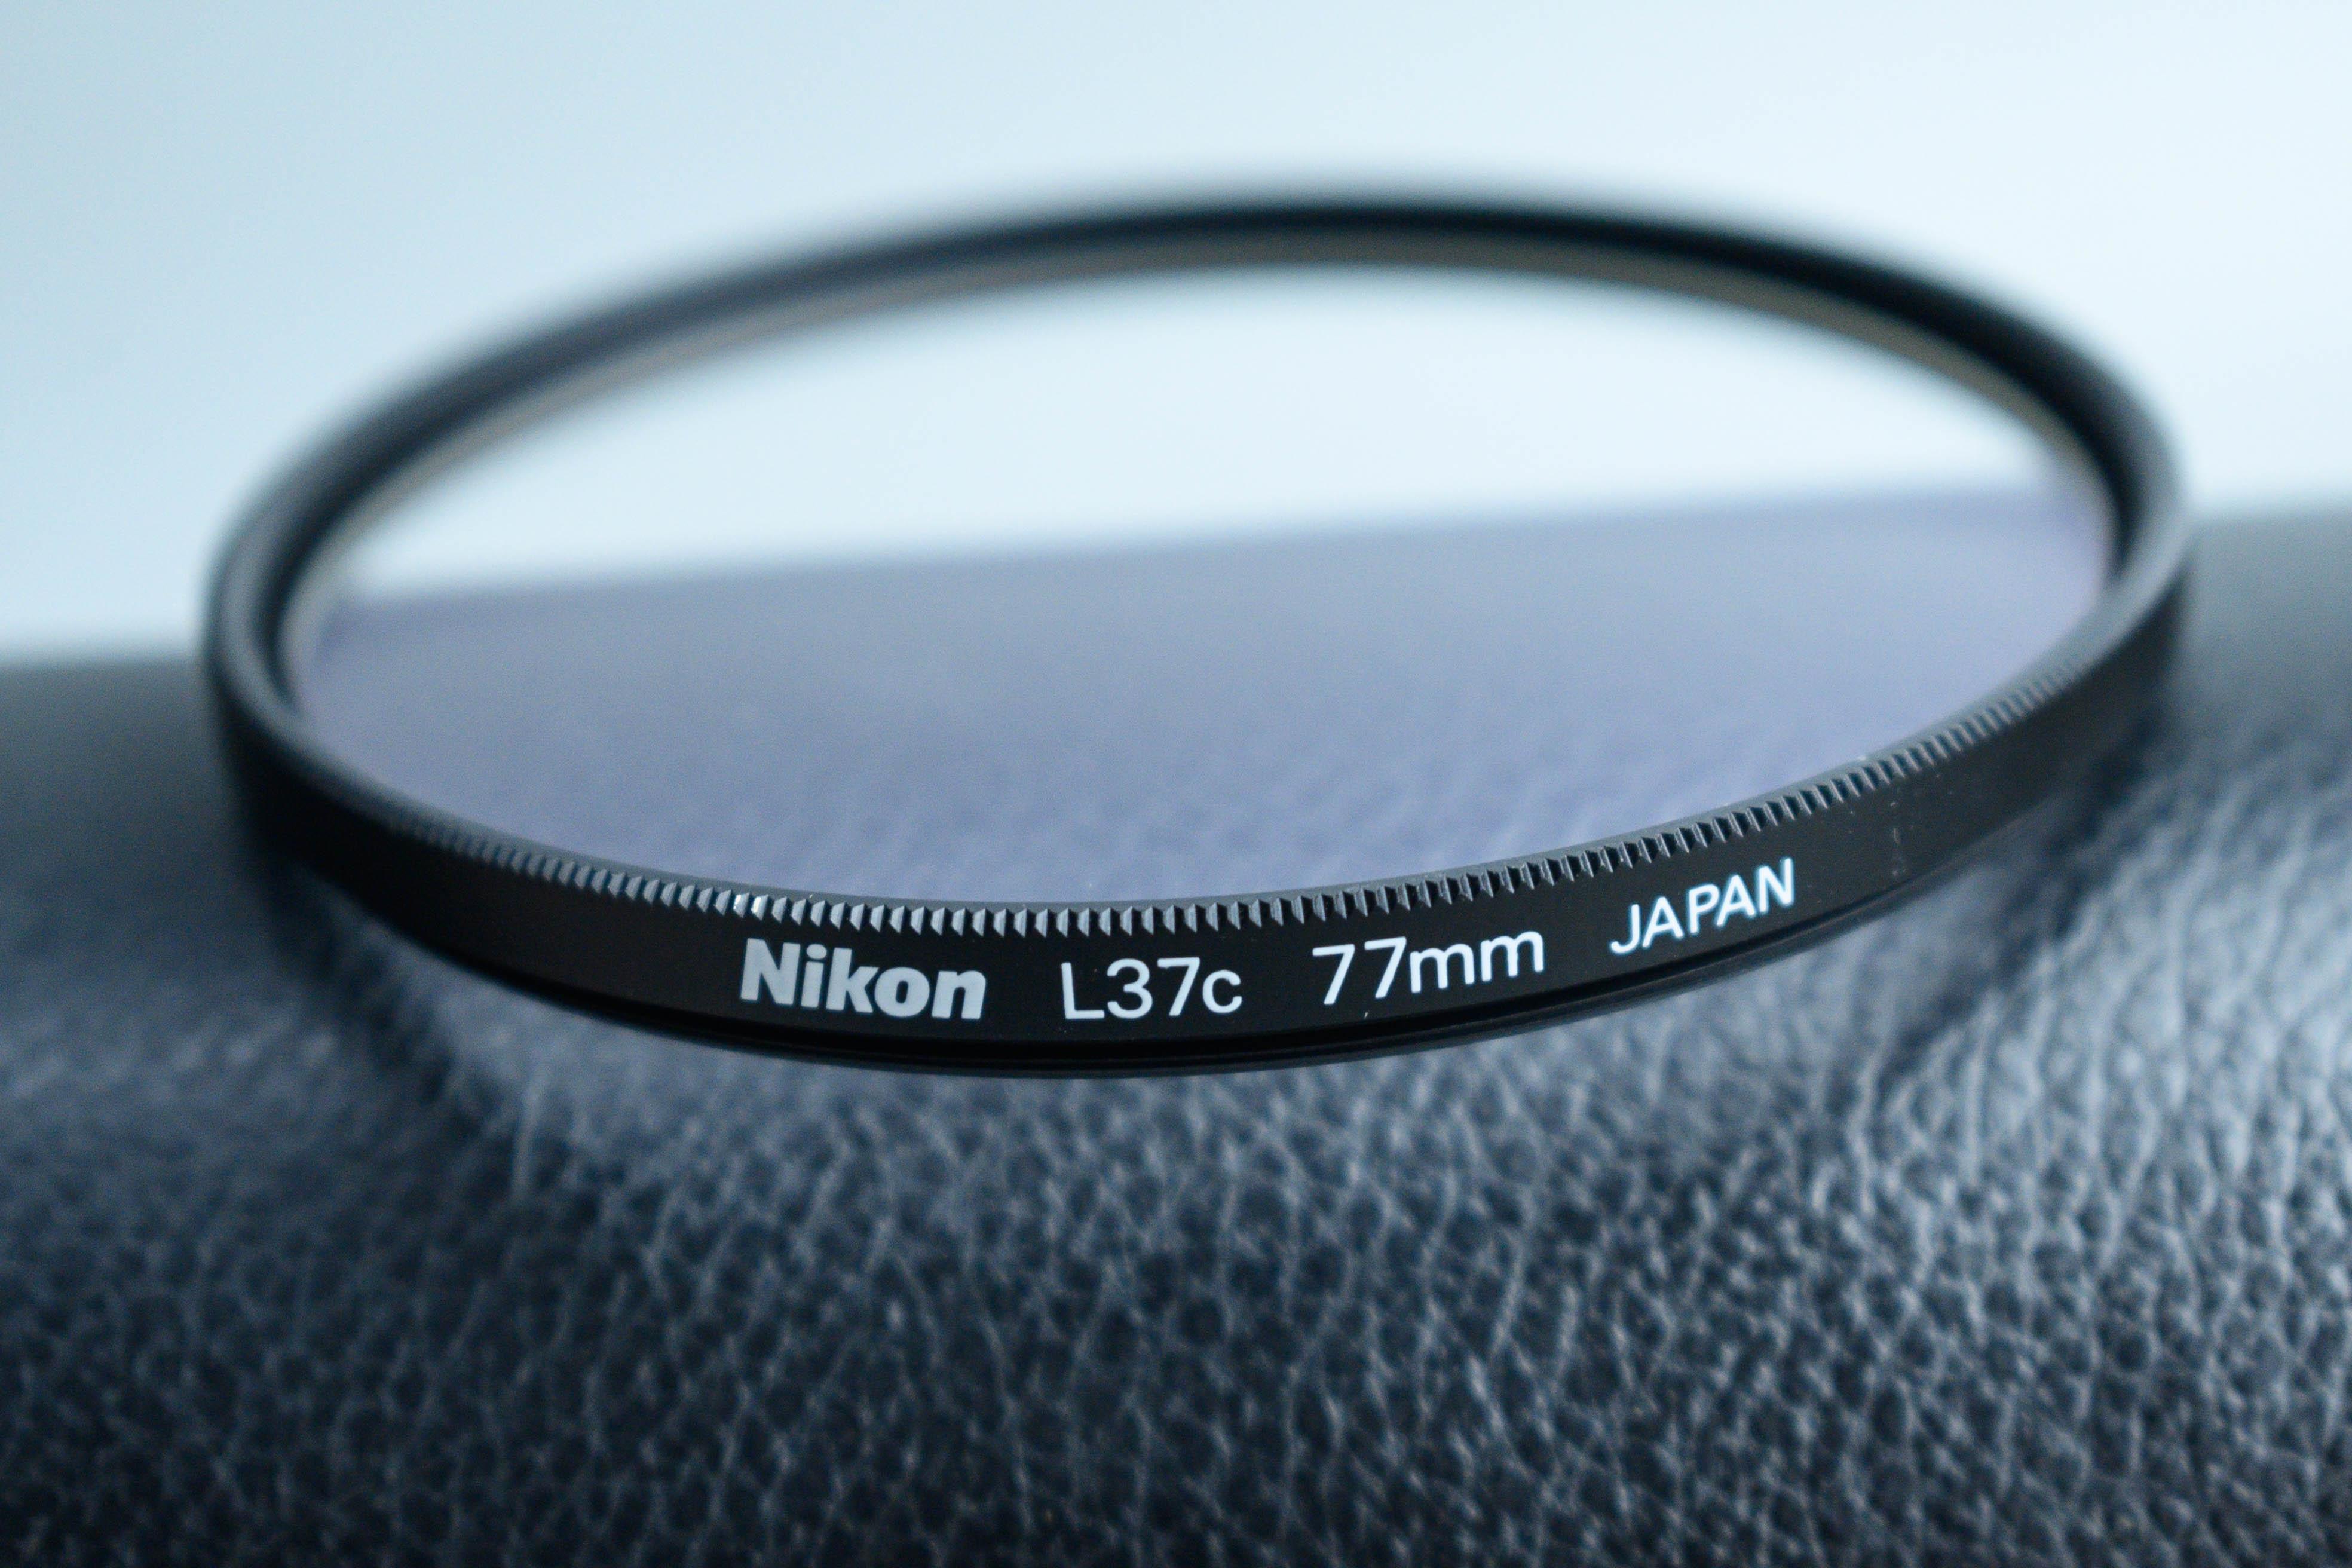 nikon-l37c-77mm-japan-filter